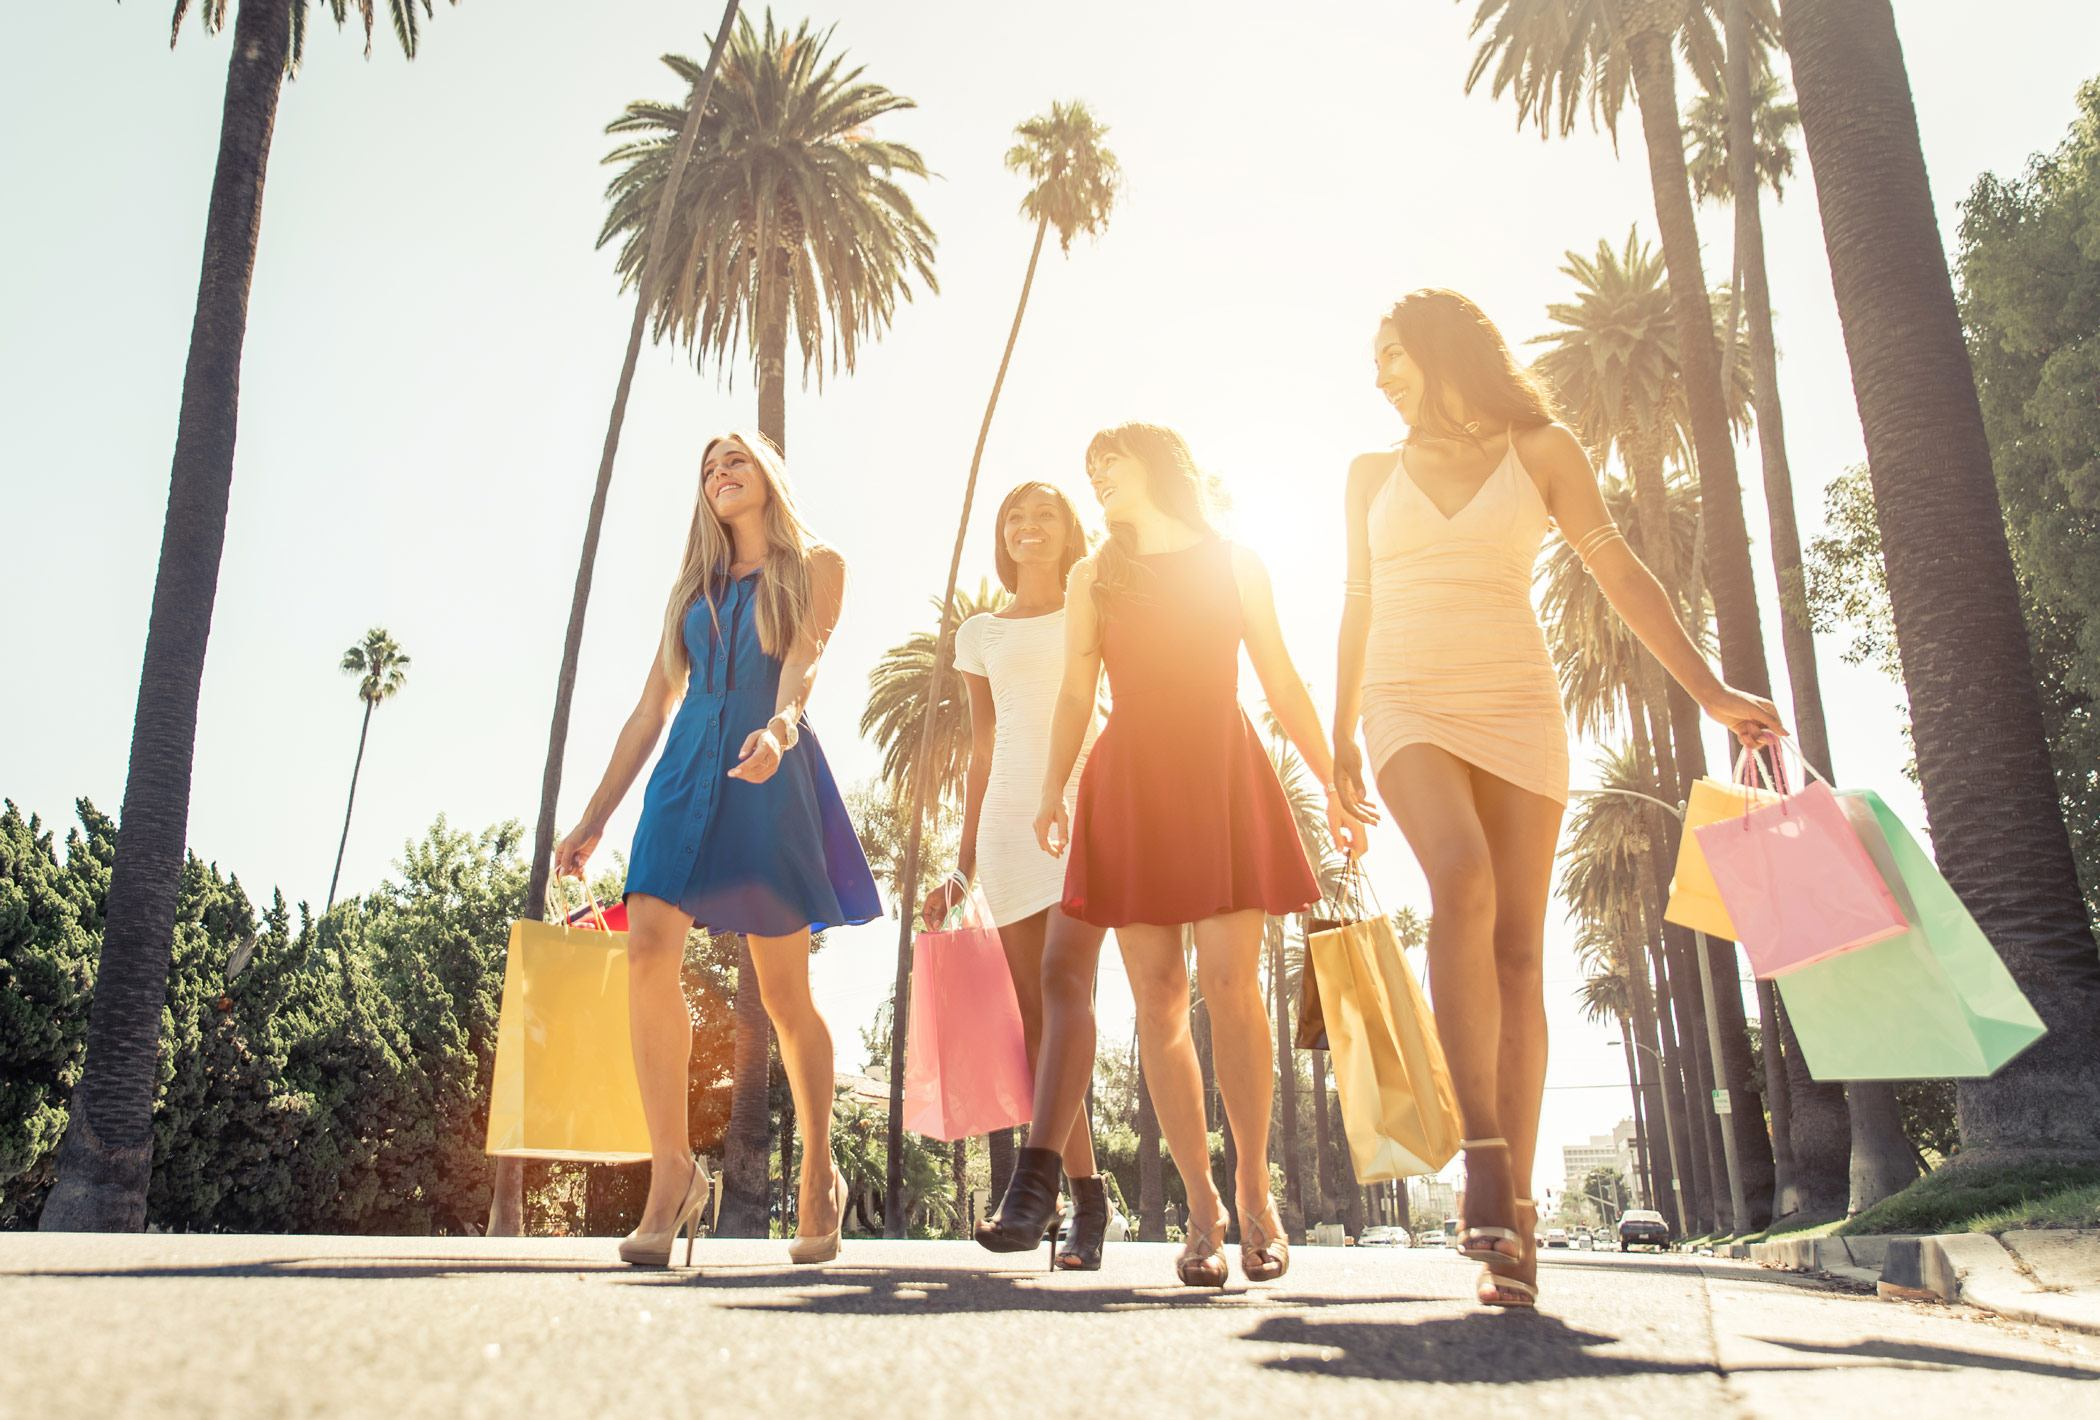 avenue-of-the-arts-costa-mesa-shopping